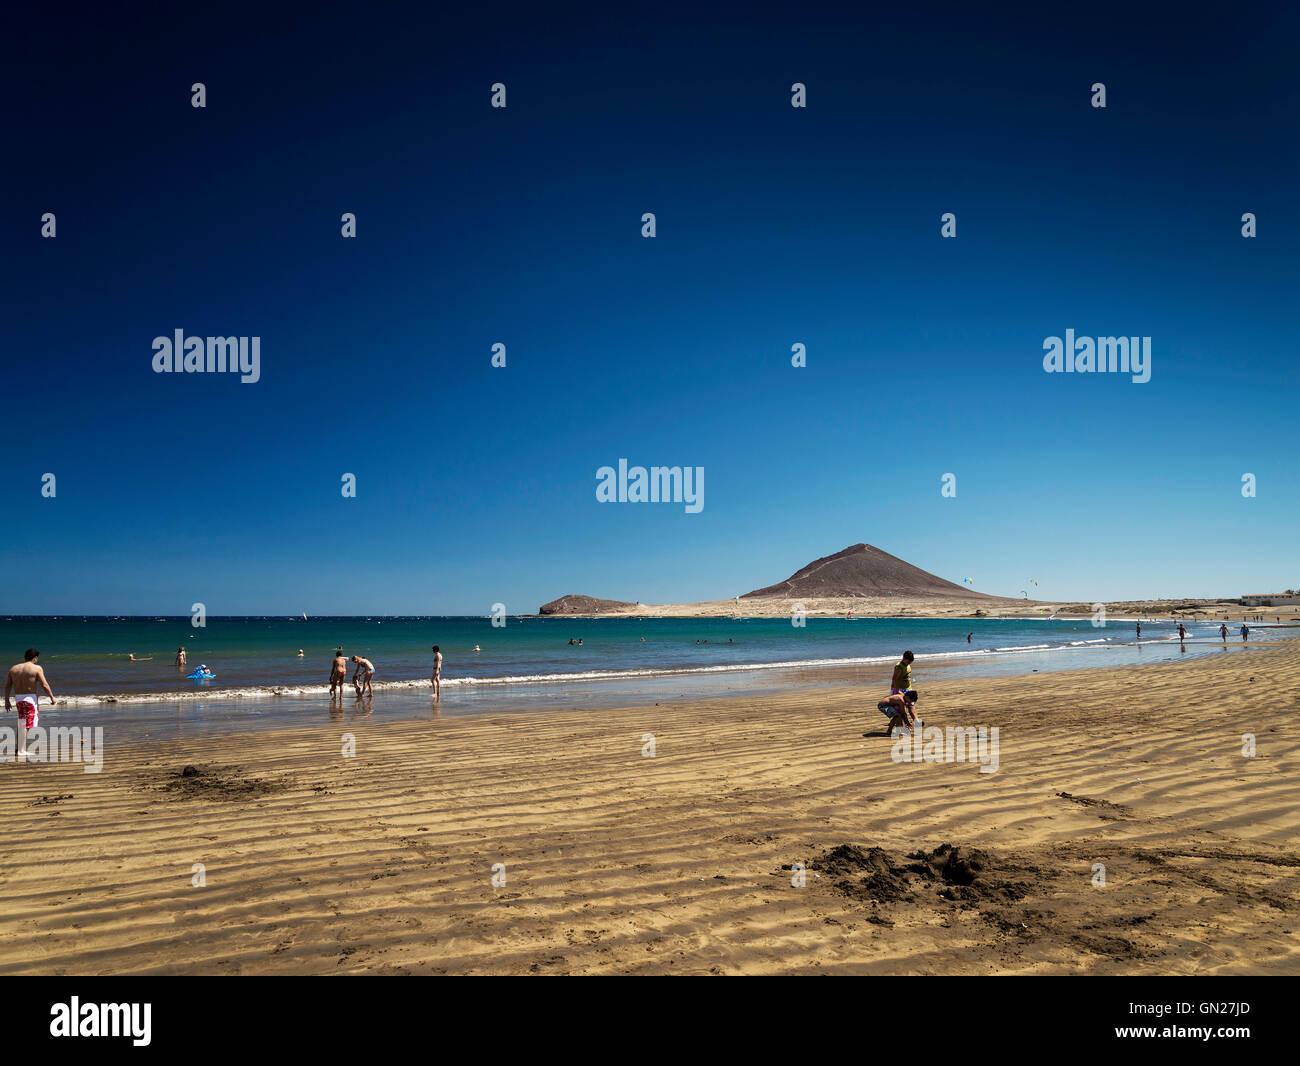 toursists at el medano beach and montana roja mountain landmark in south tenerife island spain - Stock Image